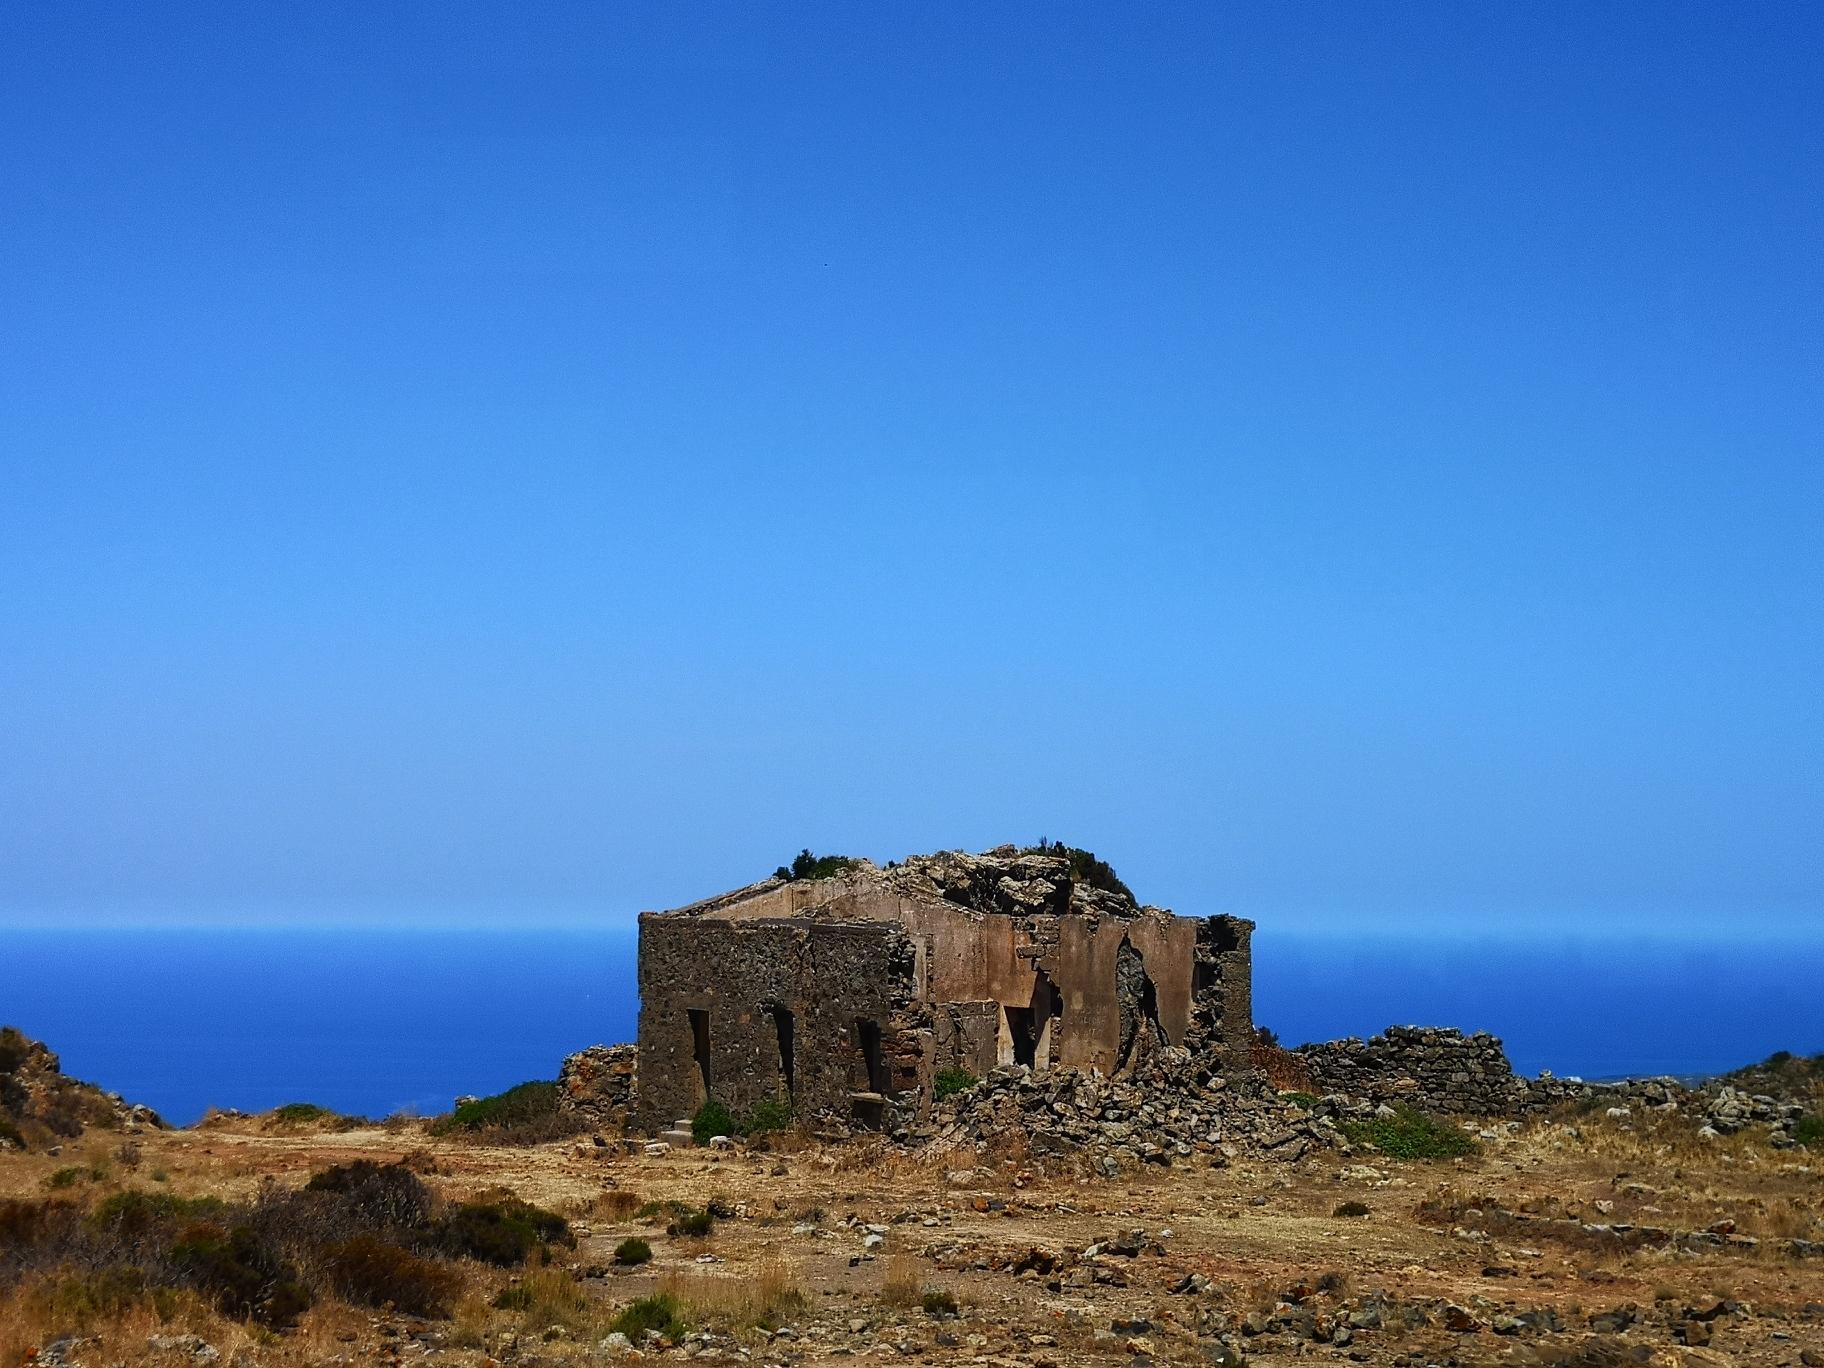 http://www.viaggiavventurenelmondo.it/immagini/verdepantelleria.jpg